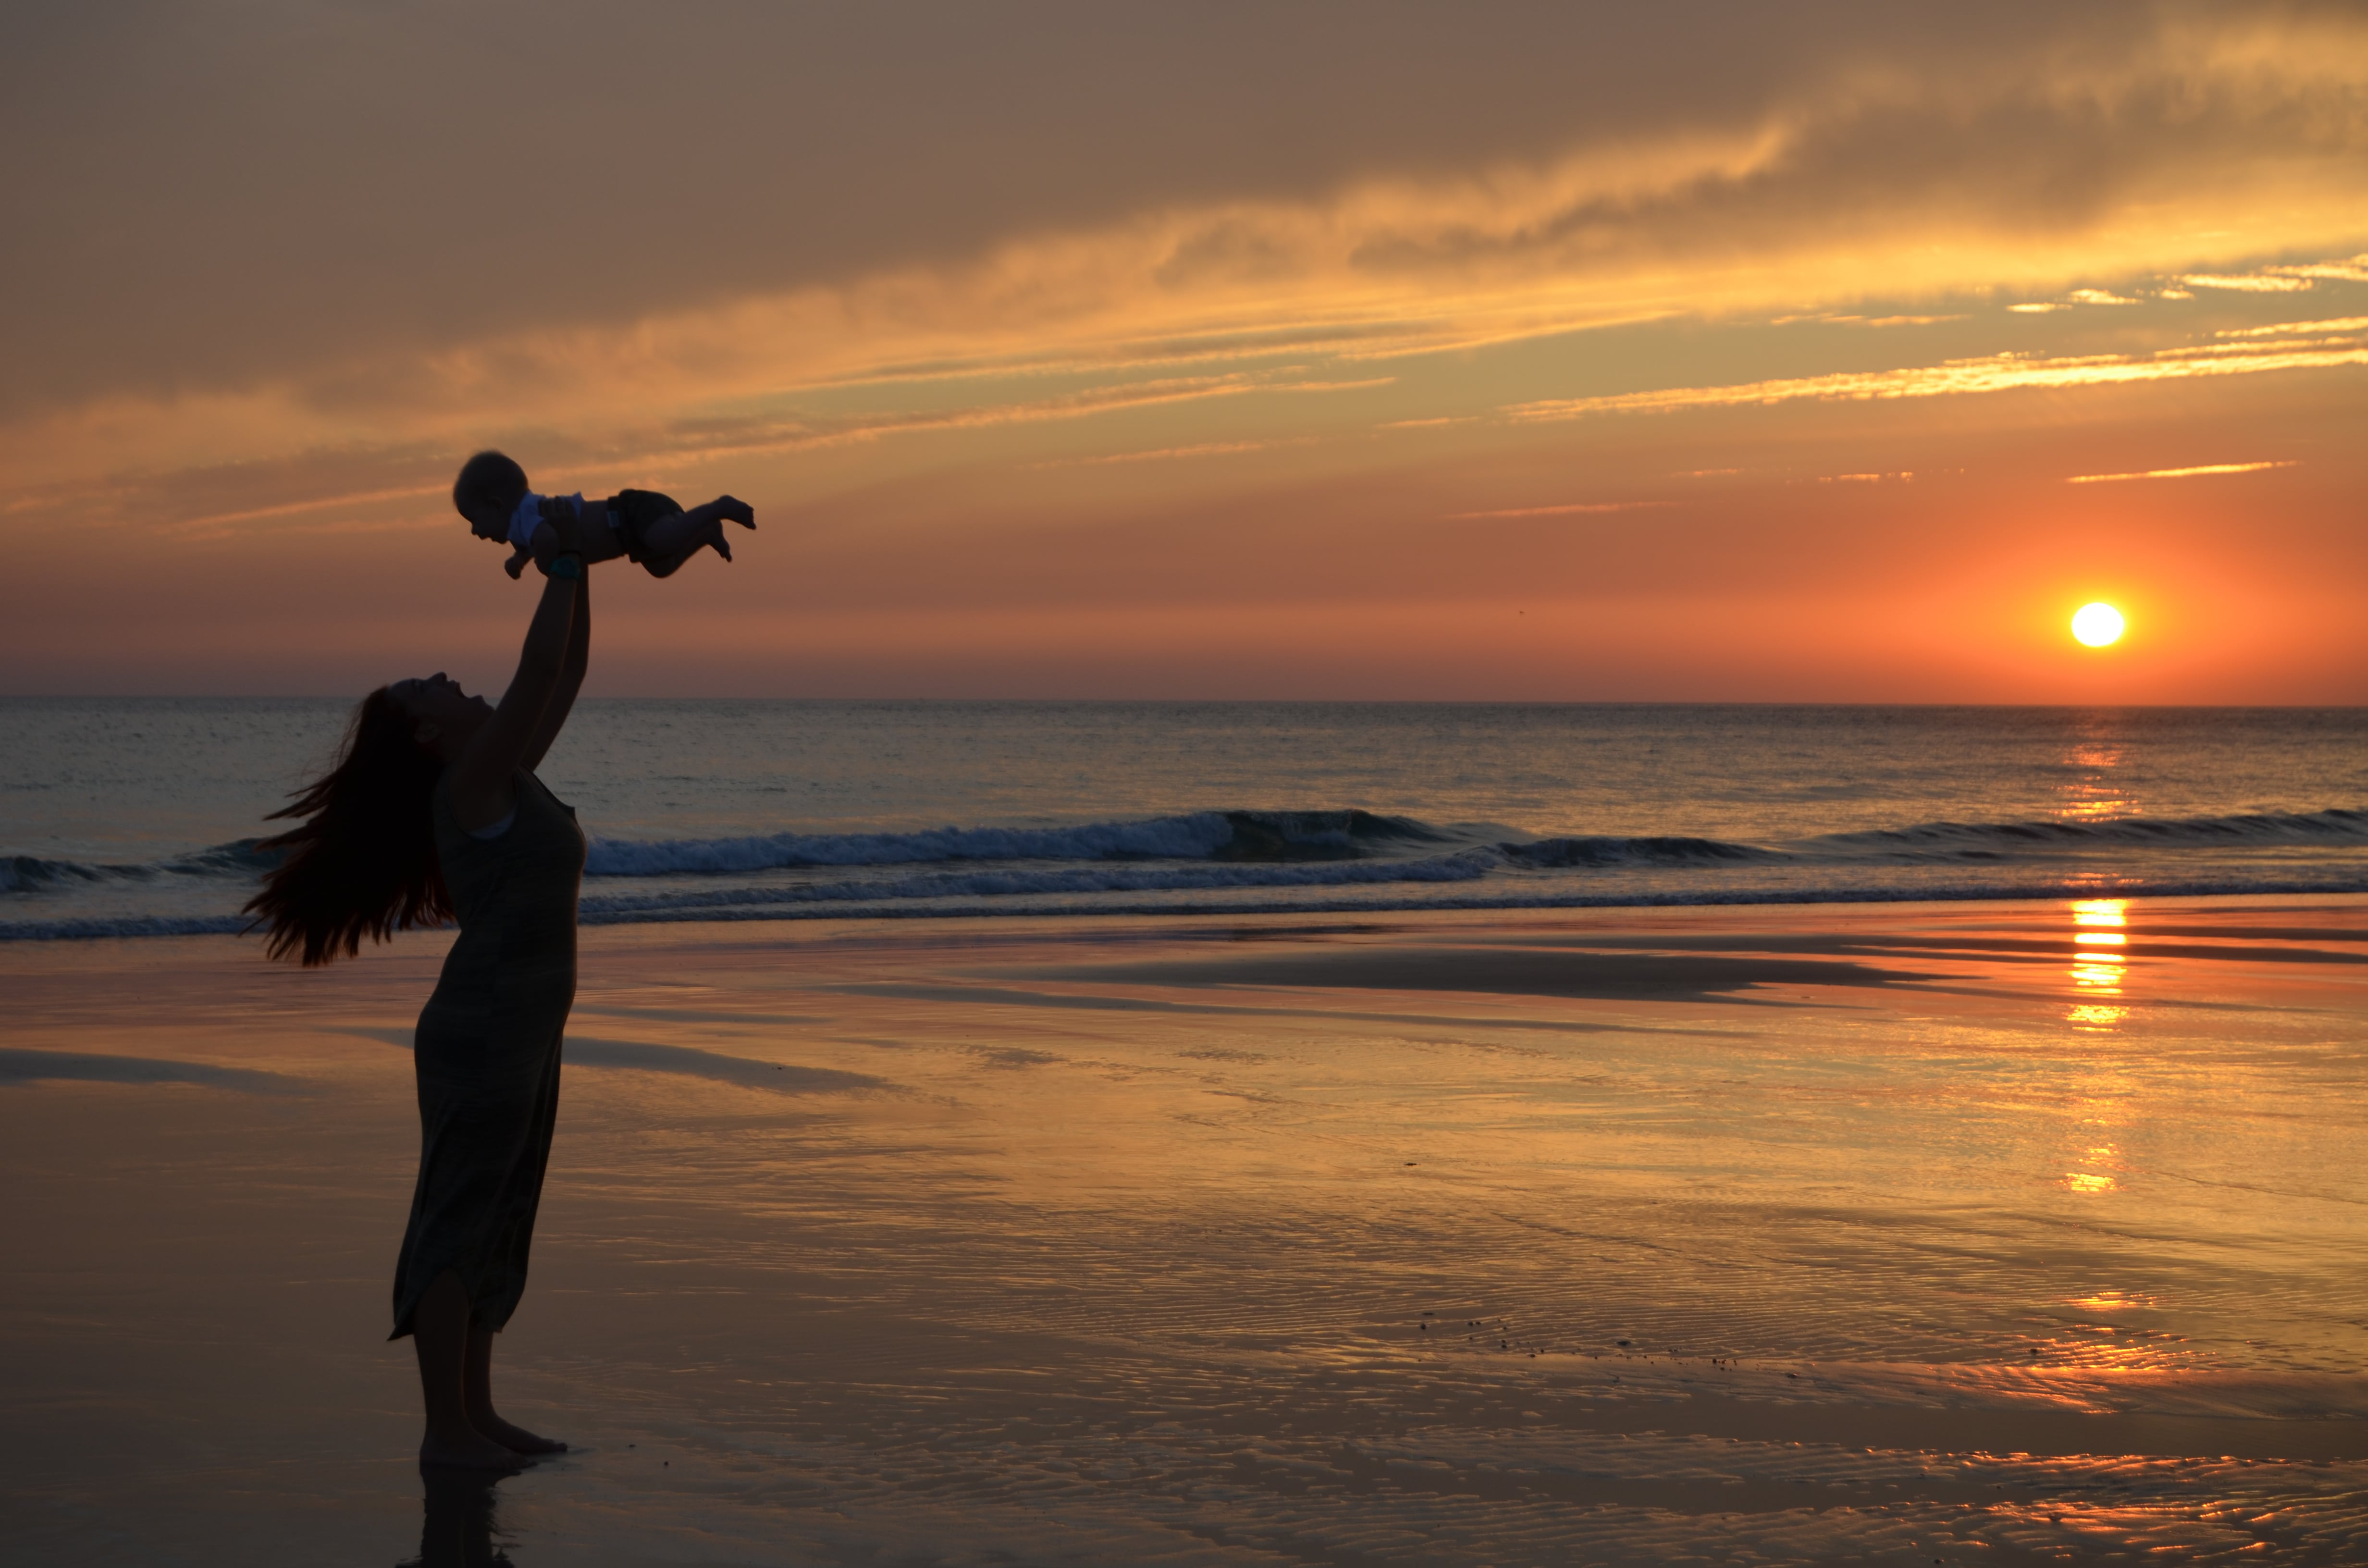 máma e hija, viajar con hijos